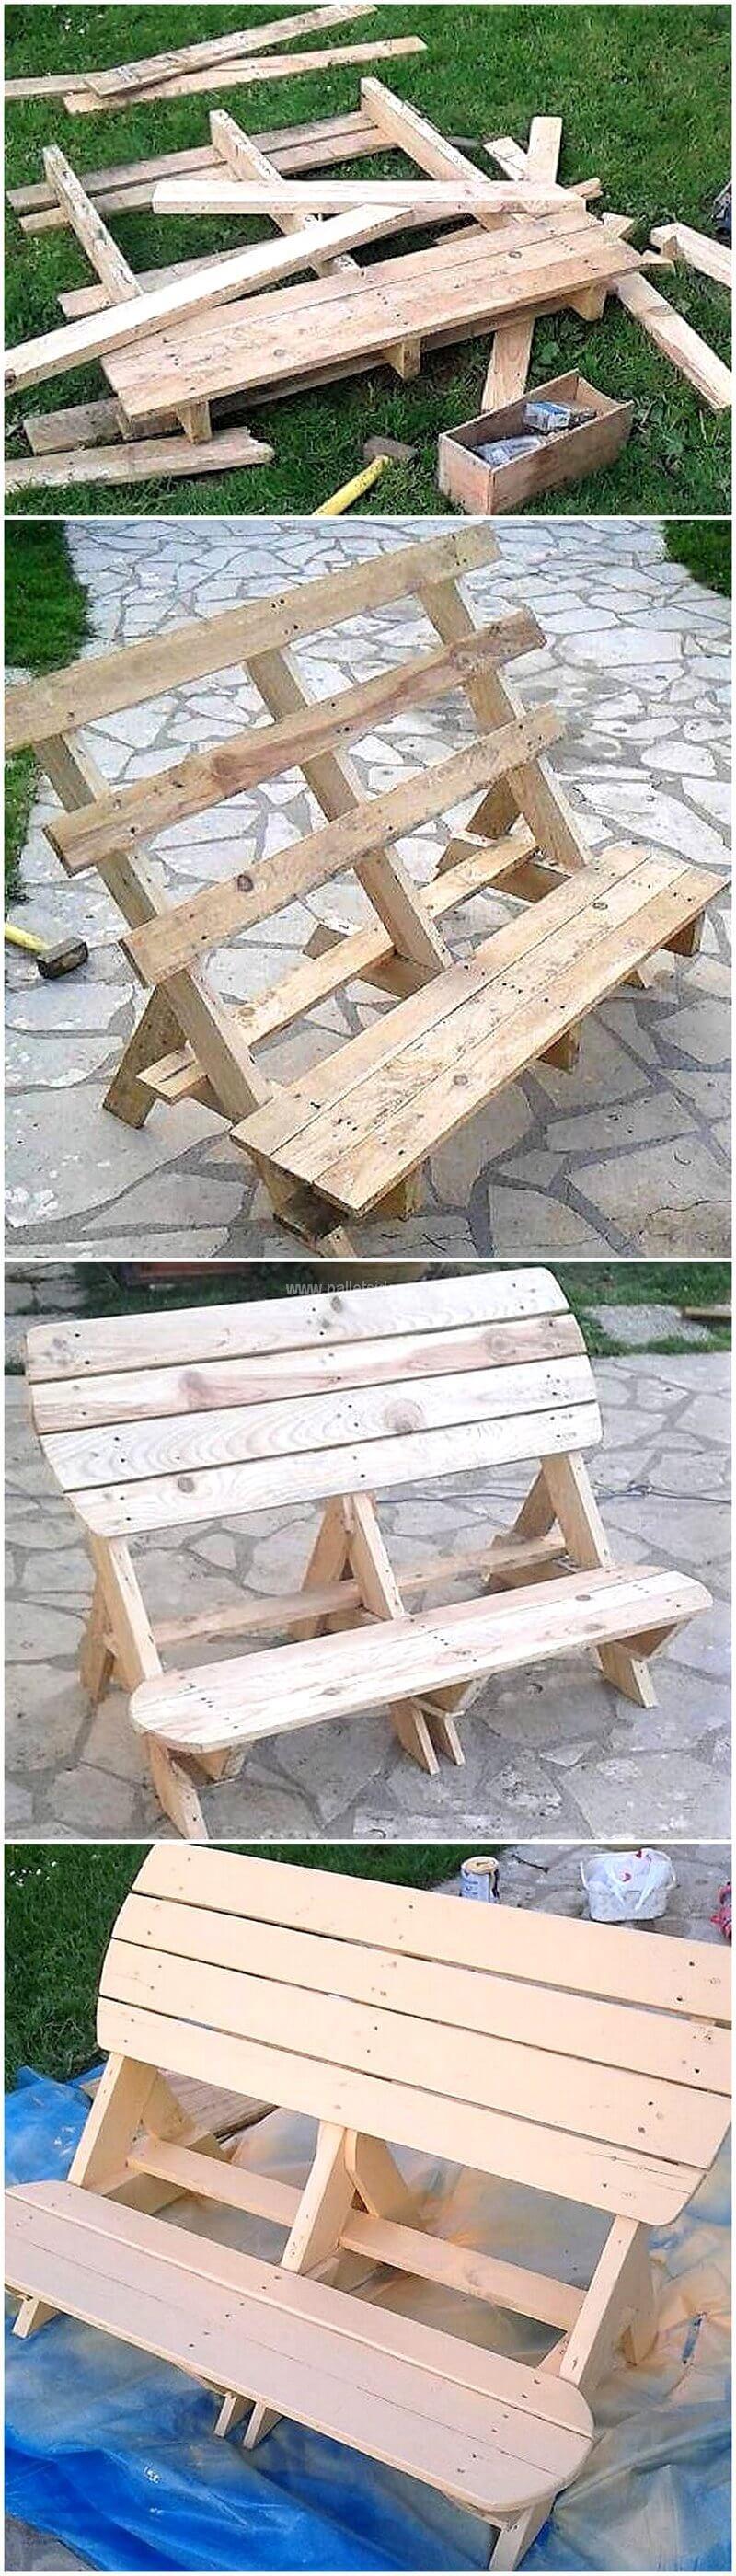 Surprising Diy Cute Pallets Made Garden Bench Pallet Ideas Pdpeps Interior Chair Design Pdpepsorg